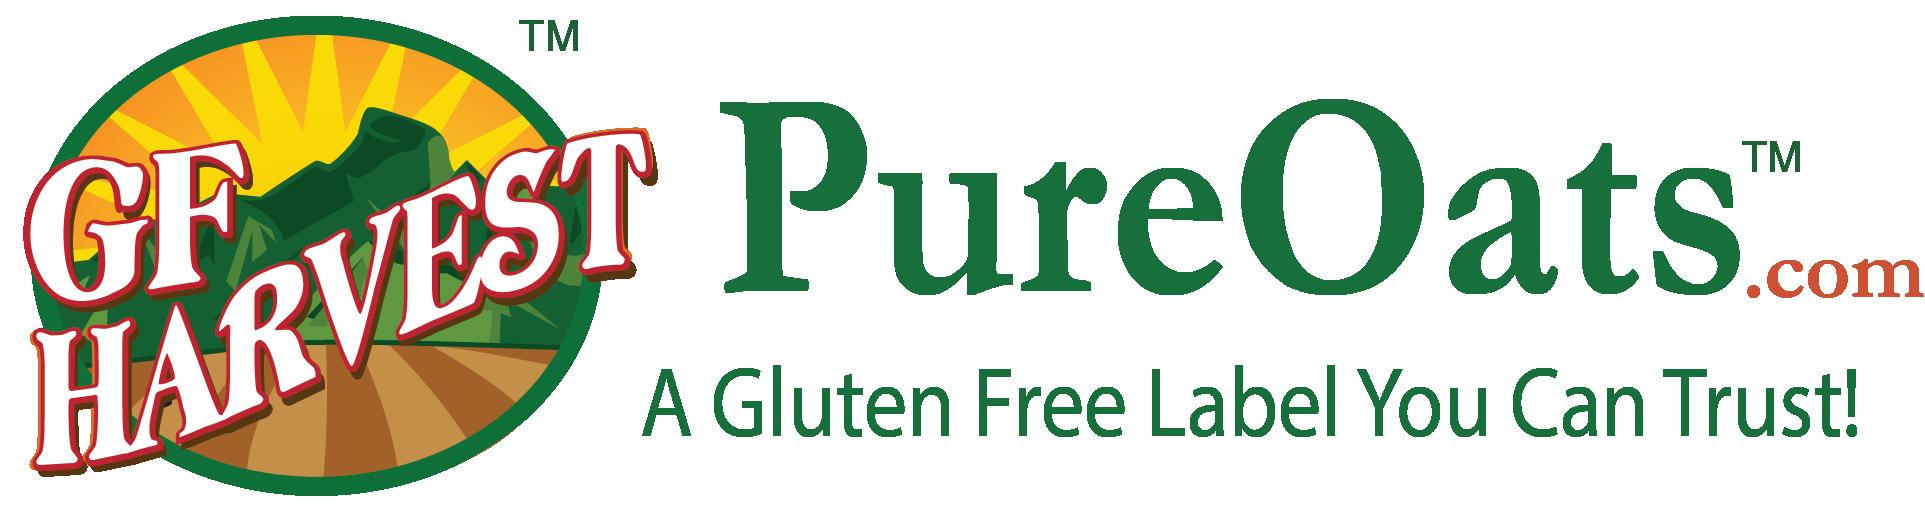 Gluten Free Oats Store - GF Harvest Brands